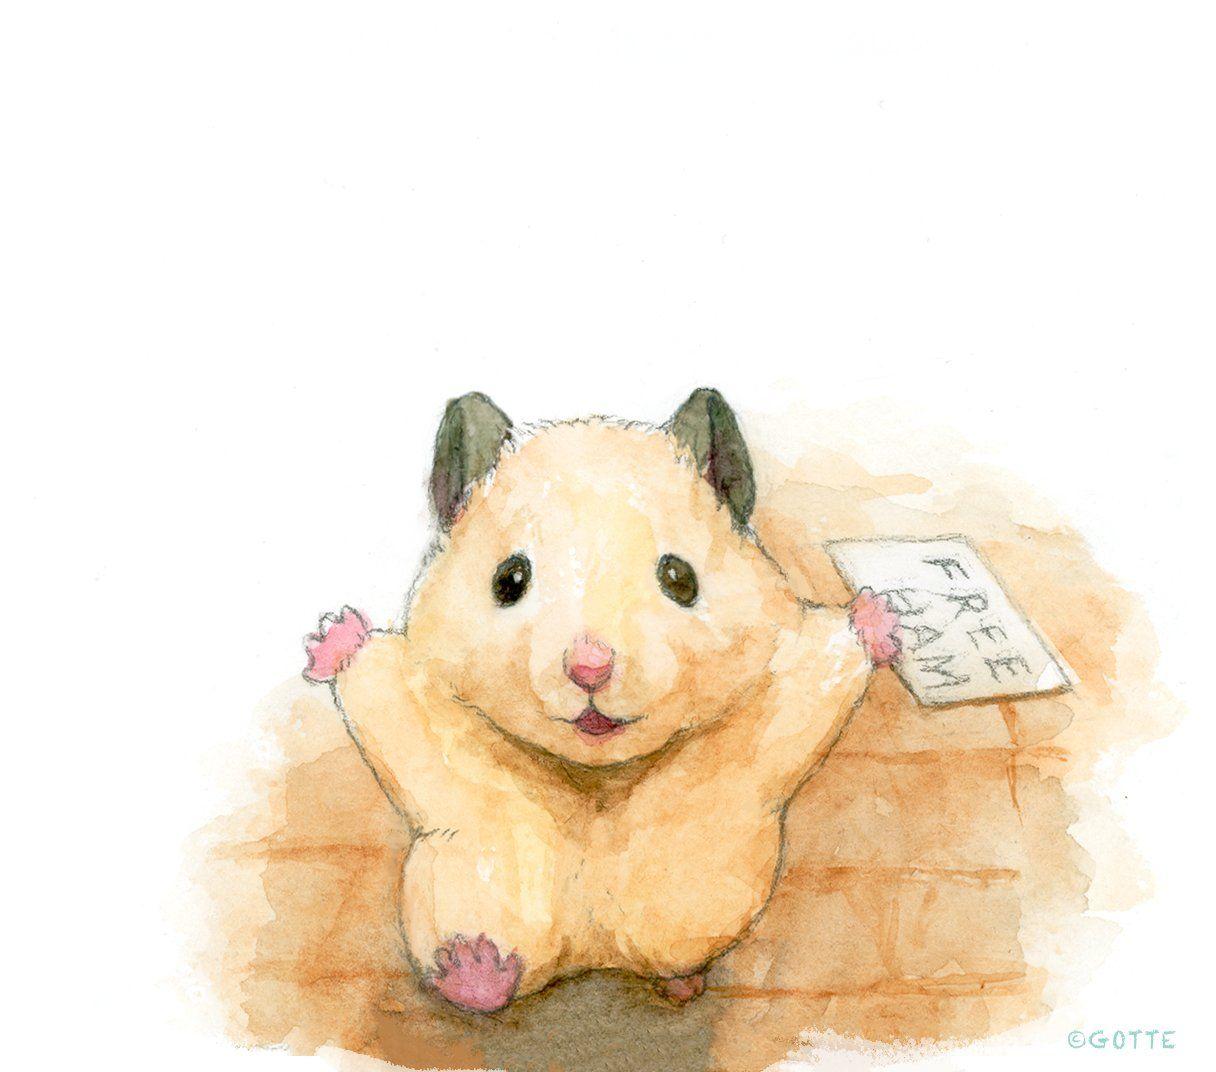 Gotte ハムスター画家 On Twitter Baby Animal Drawings Cute Animal Drawings Cute Drawings